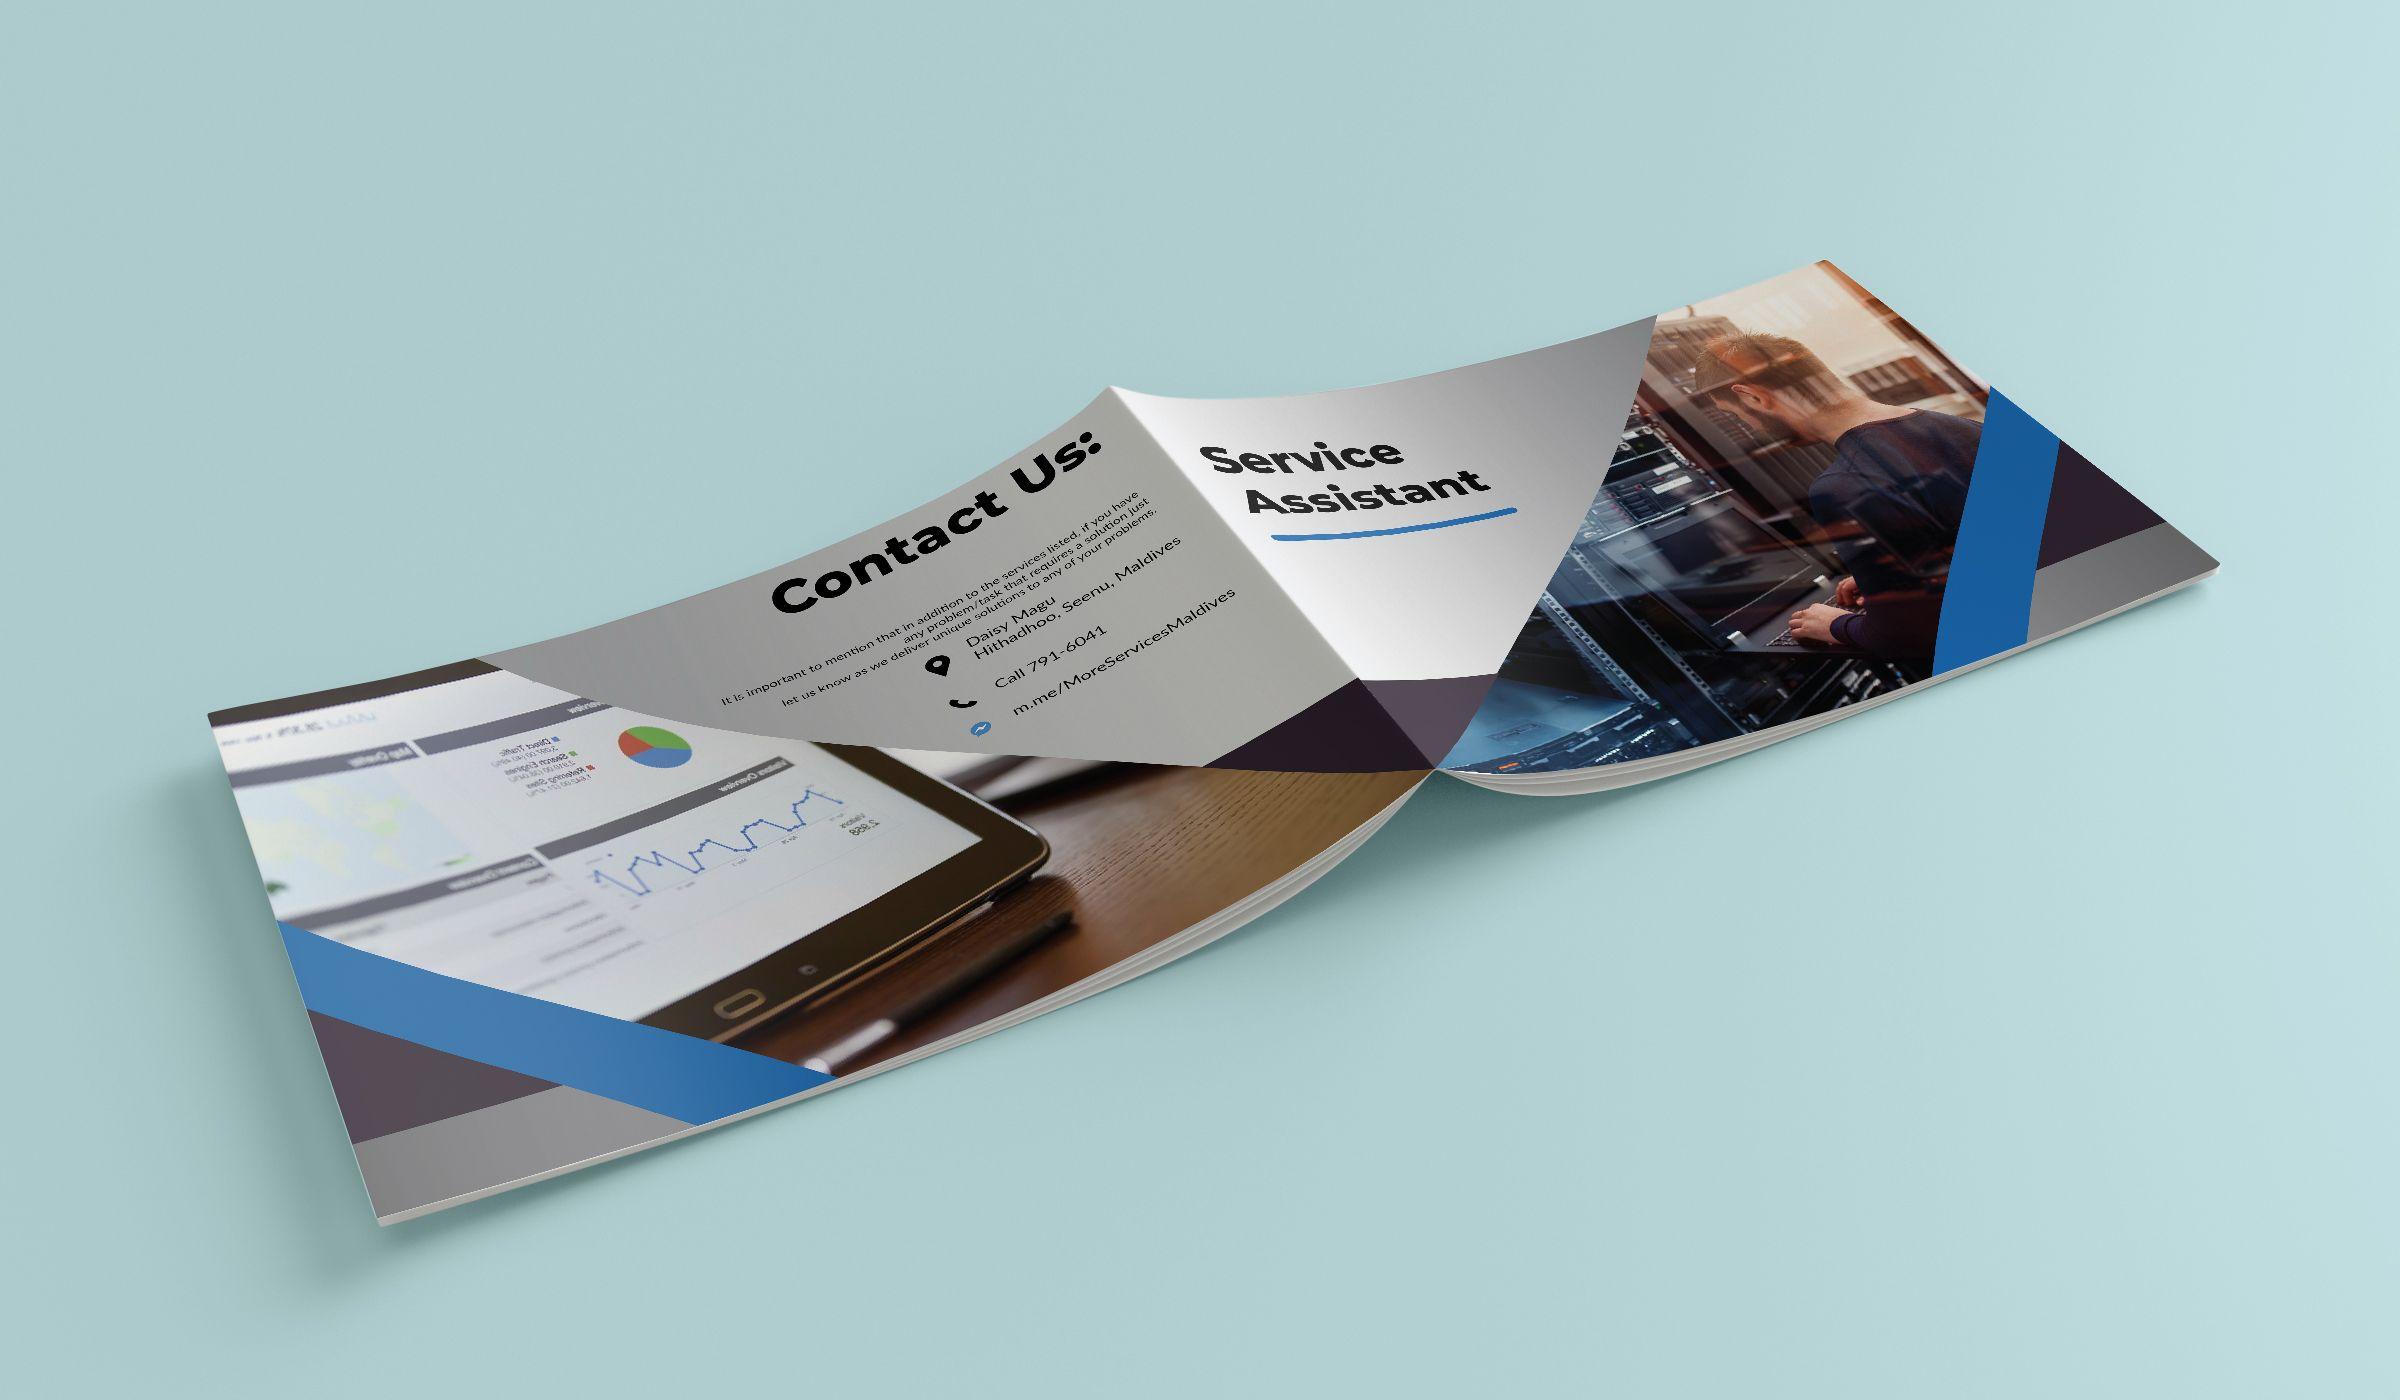 Pushpo Pro I Will Design A Professional Brochure Company Profile In 12 Hrs For 5 On Fiverr Com Professional Brochure Company Profile Company